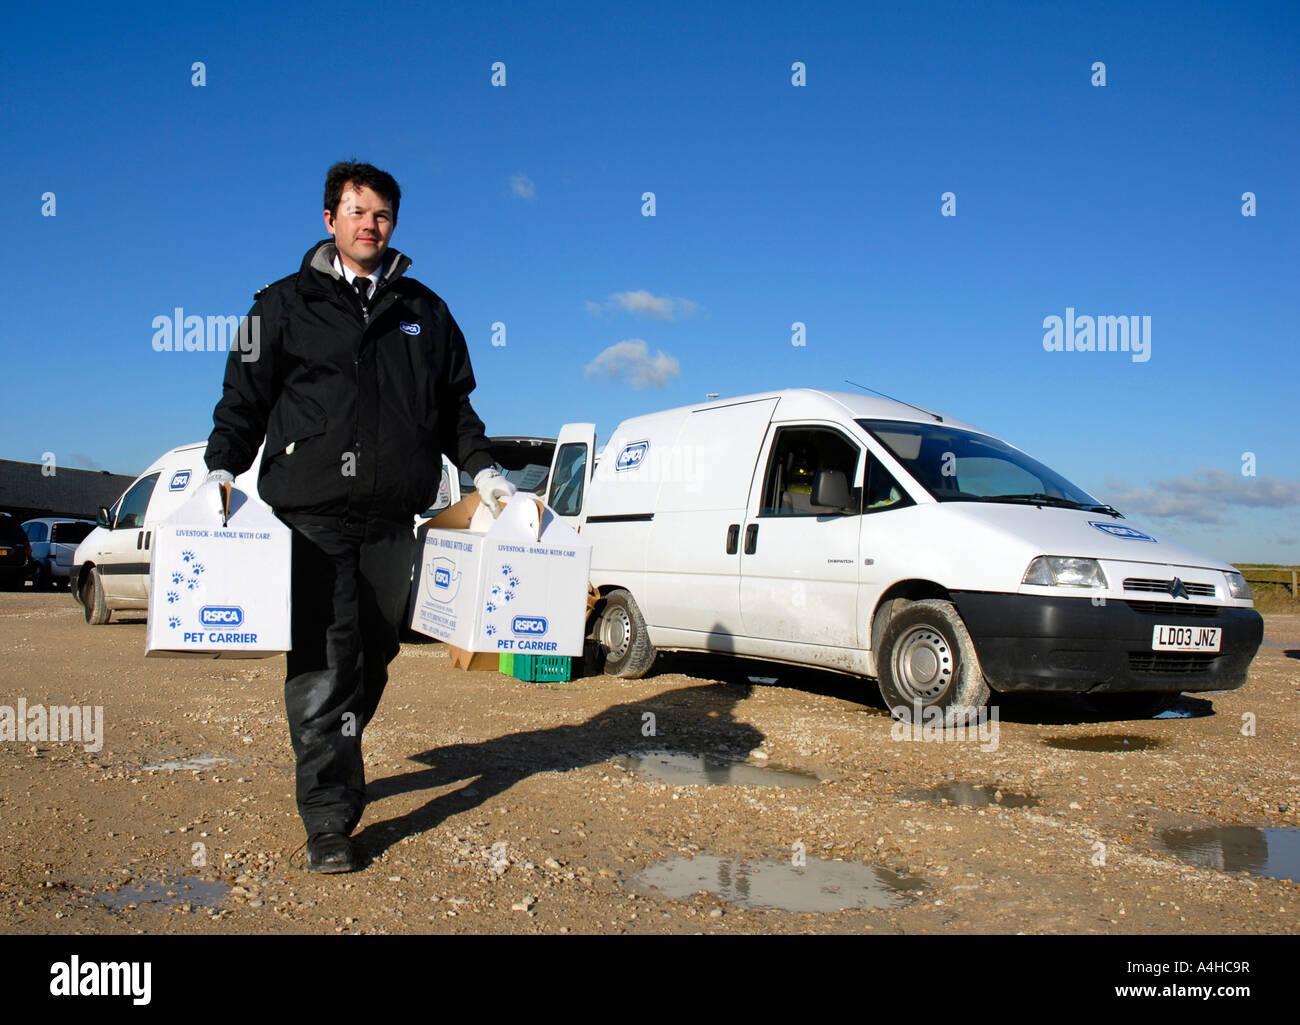 RSPCA officer at work, Britain UK - Stock Image